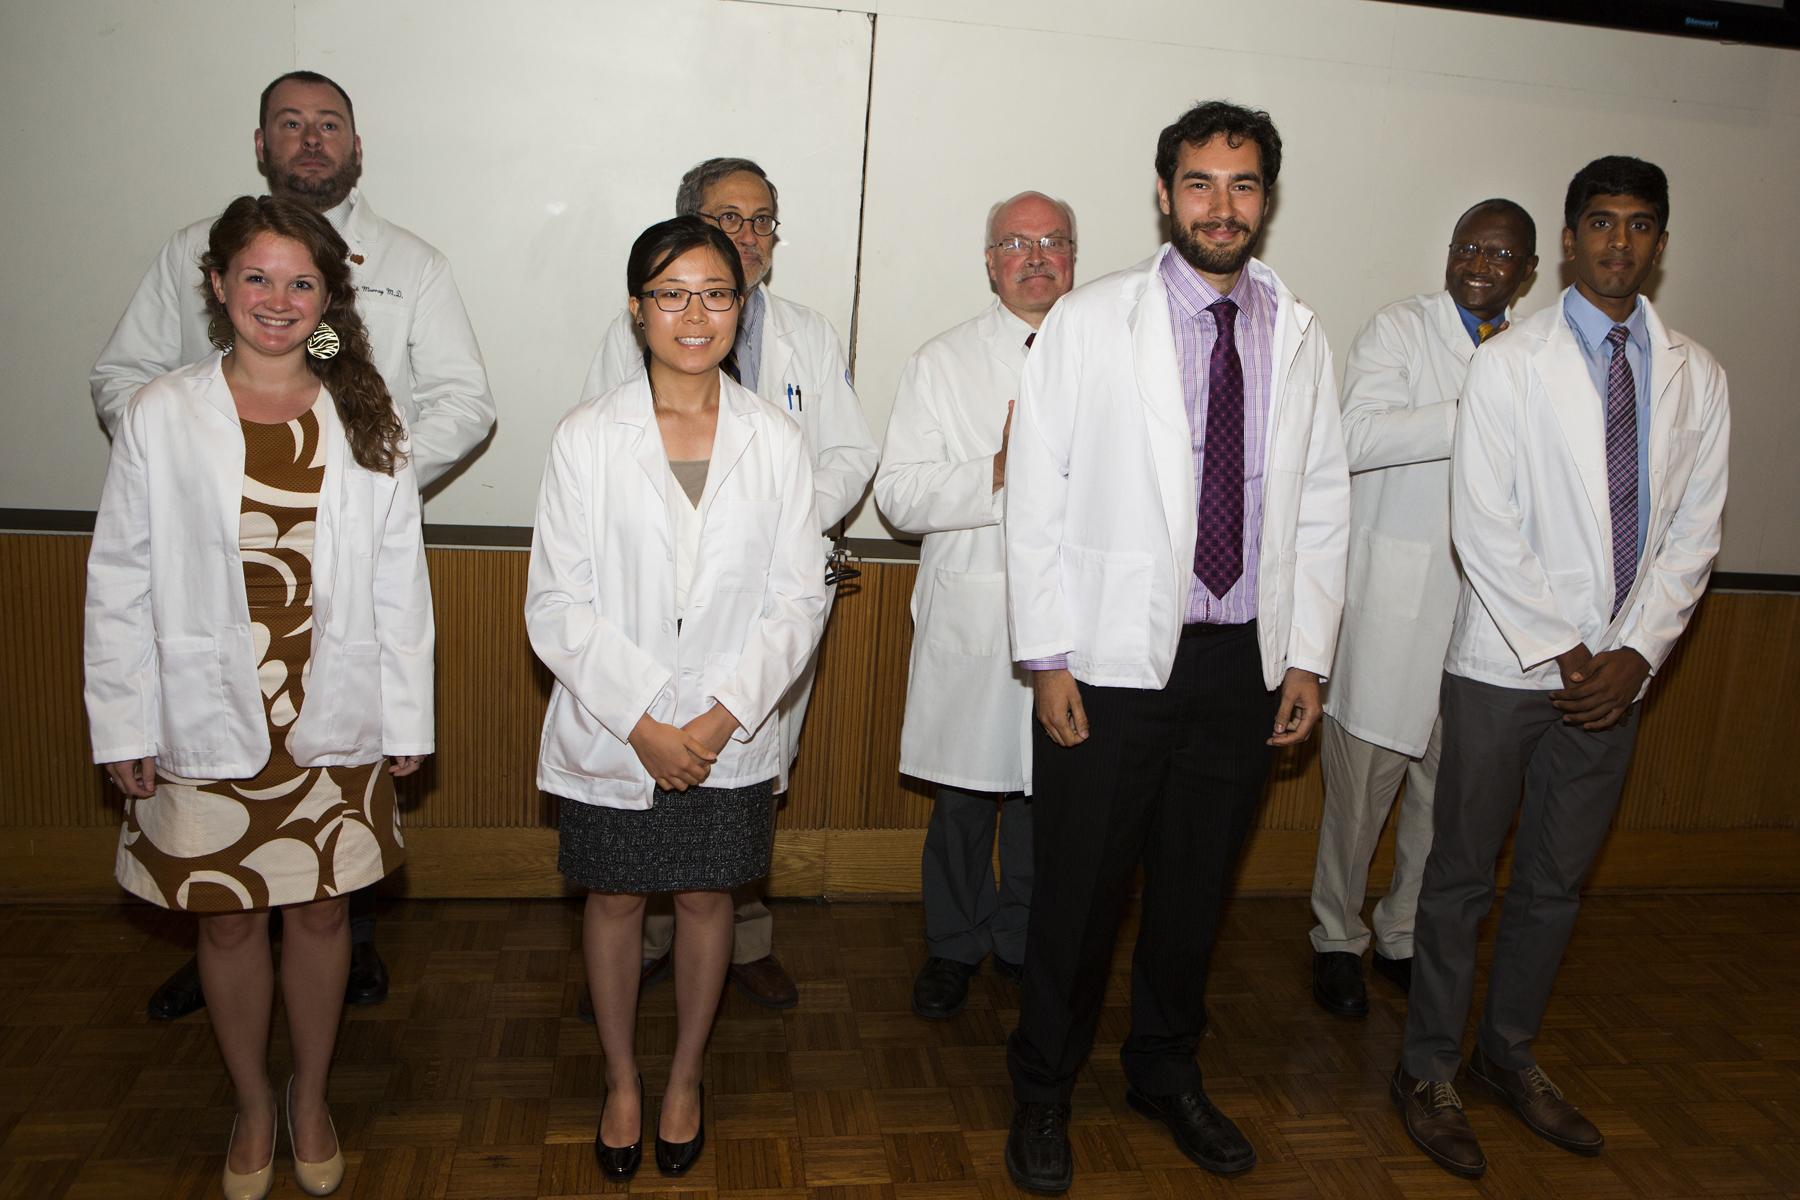 White Coat Ceremony Kicks Off Students' Careers in Medicine ...